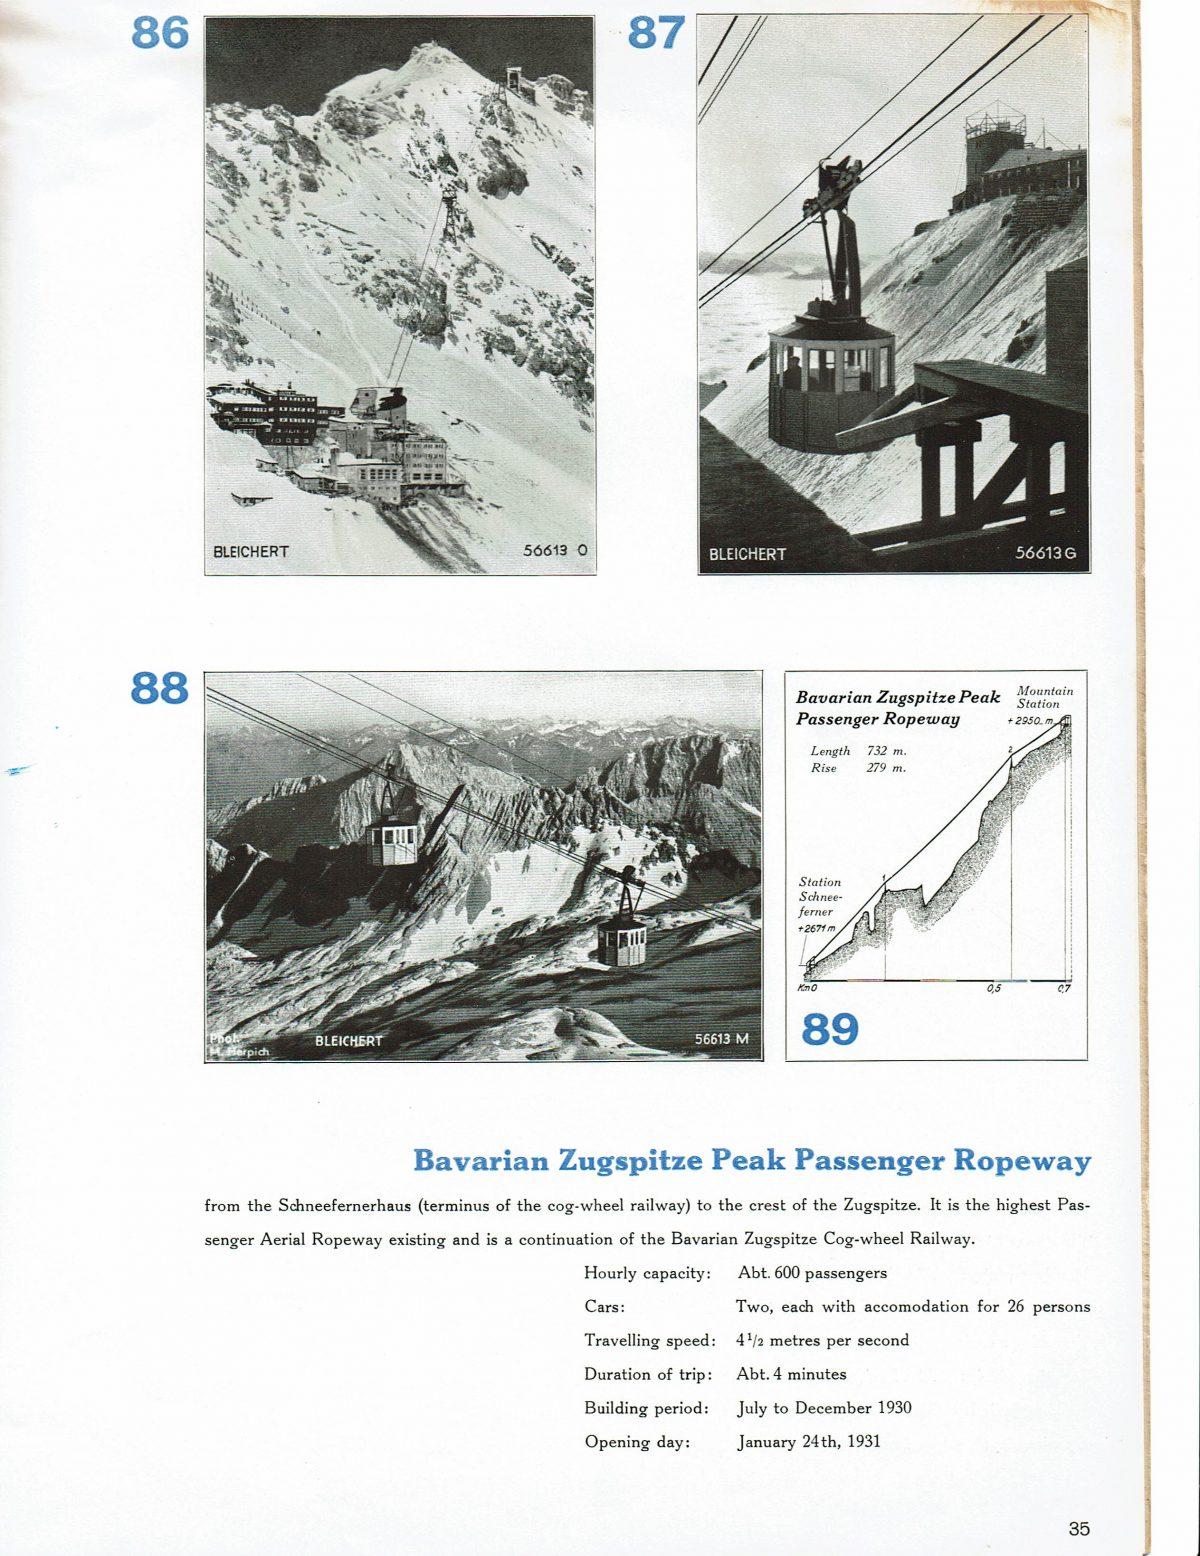 1933 Bleichert Passenger Arial Ropeways 30